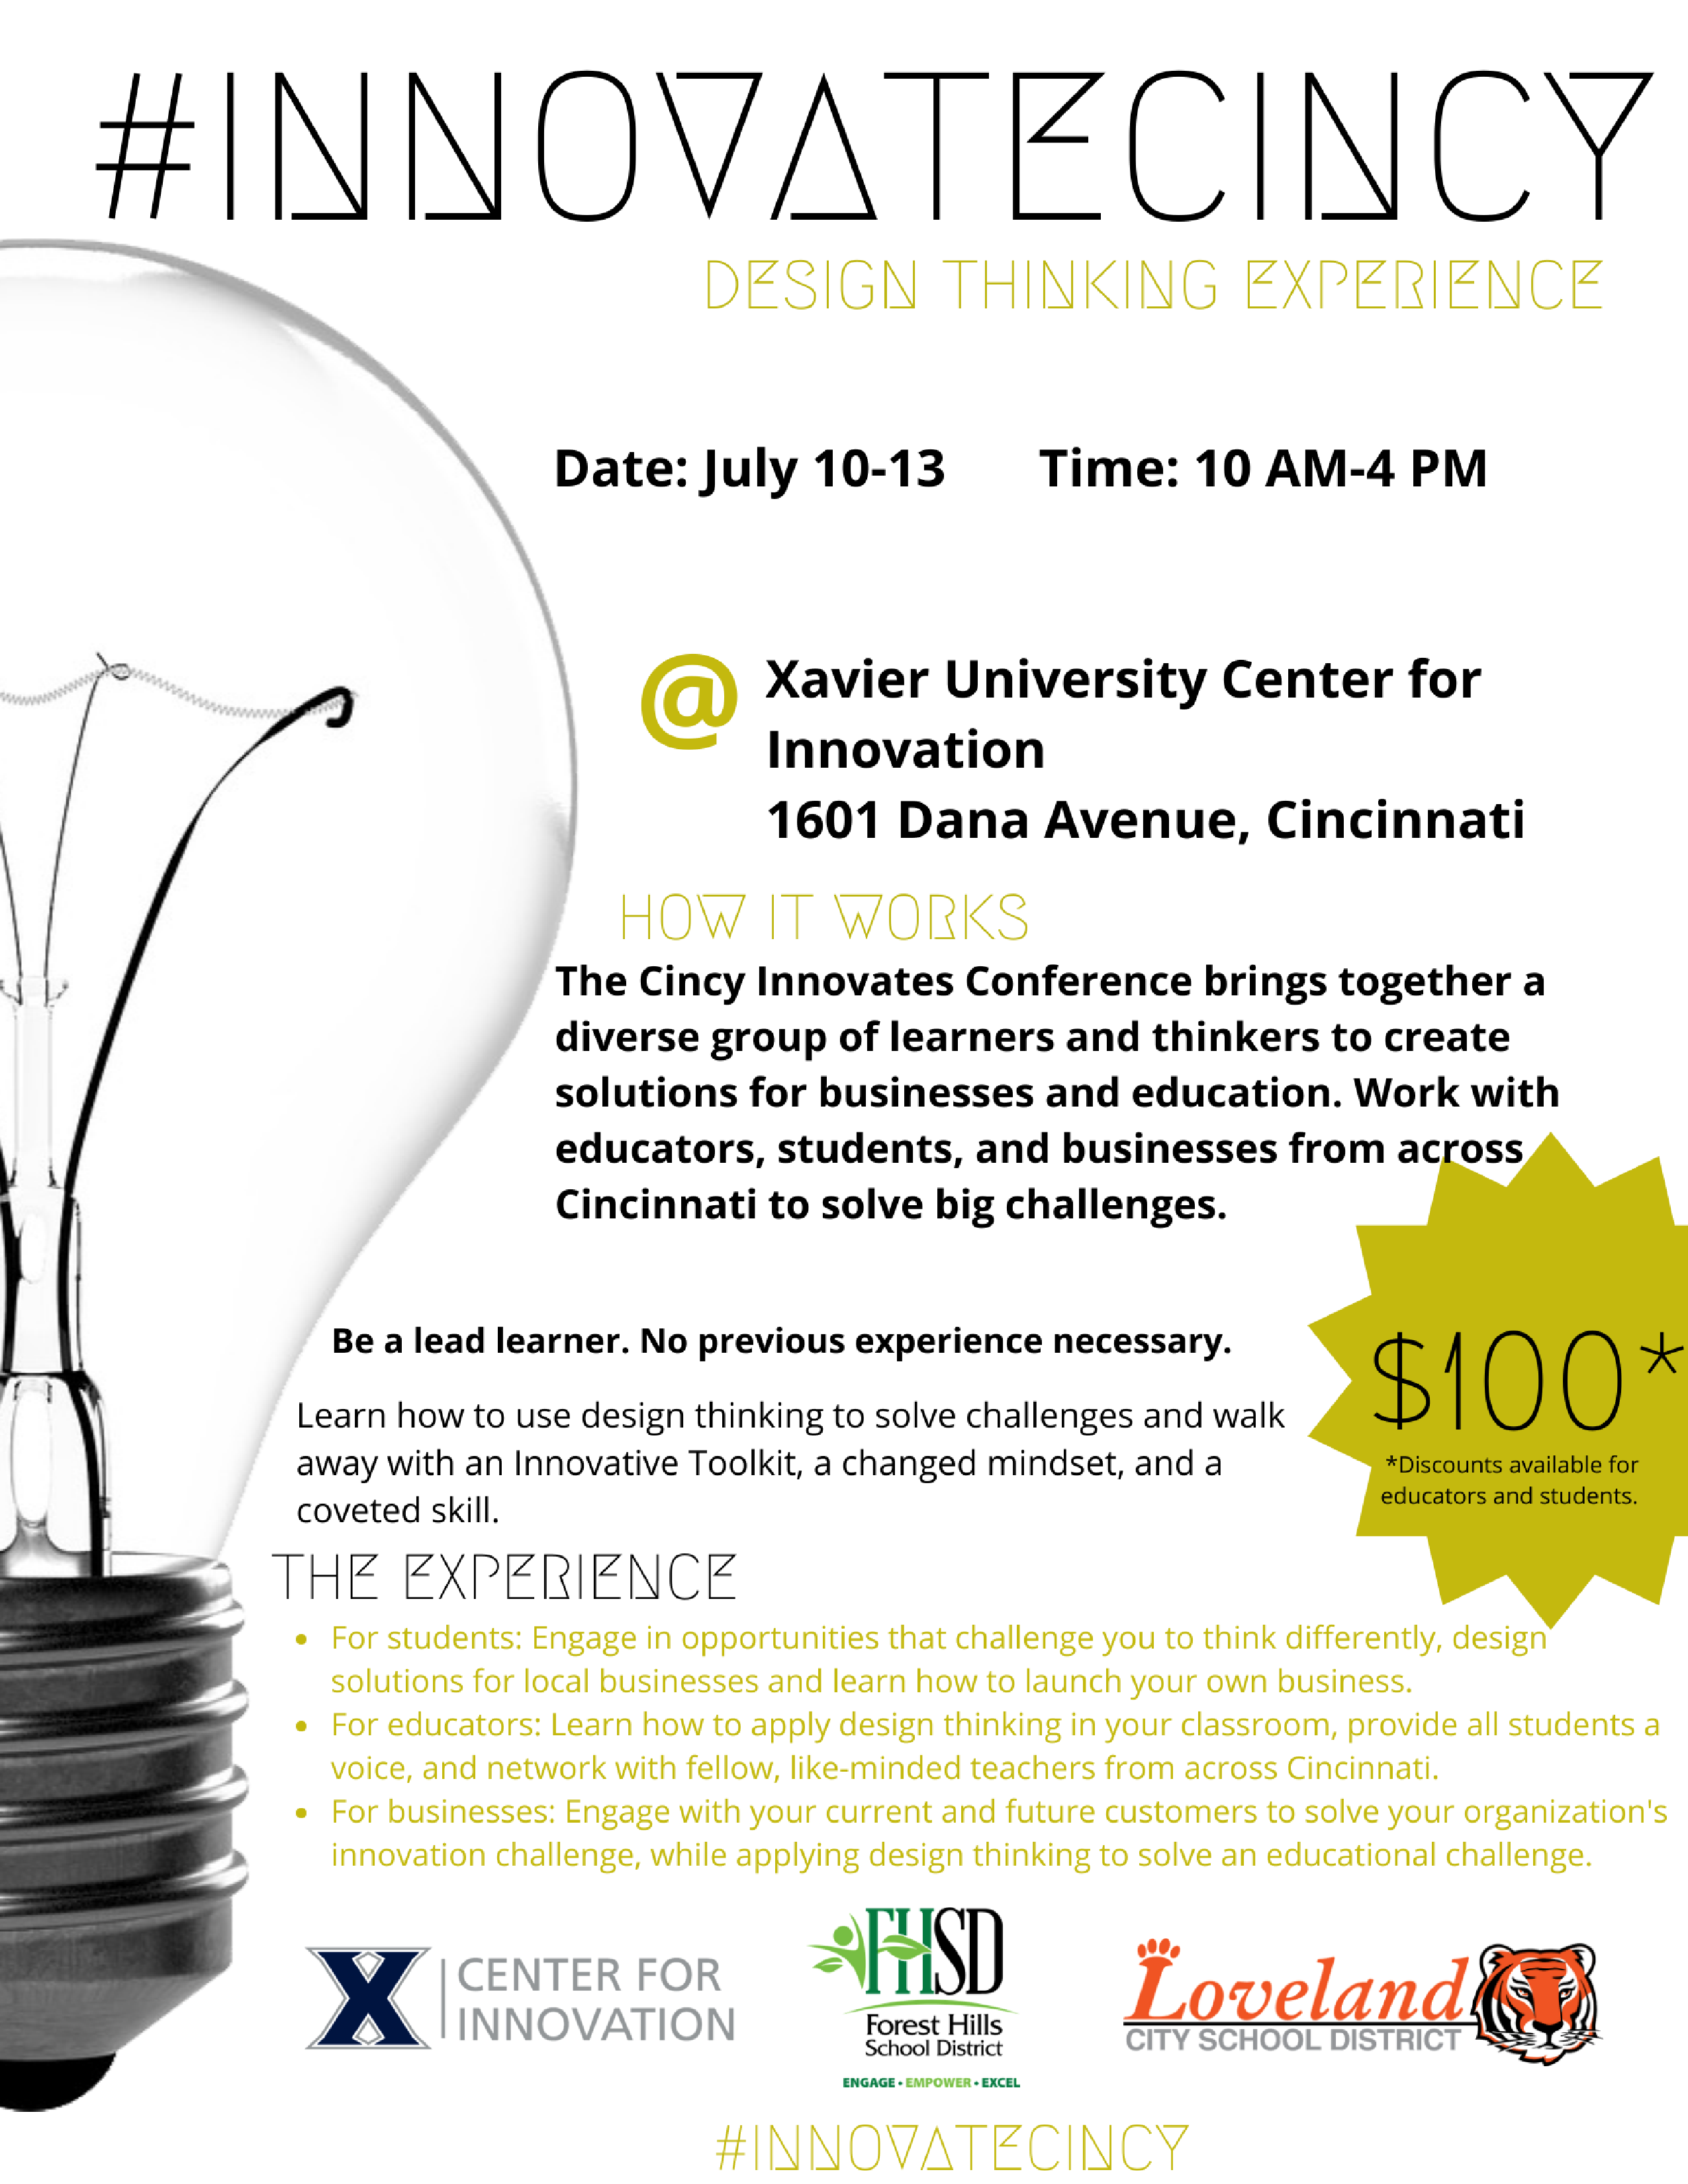 #InnovateCincy Flyer